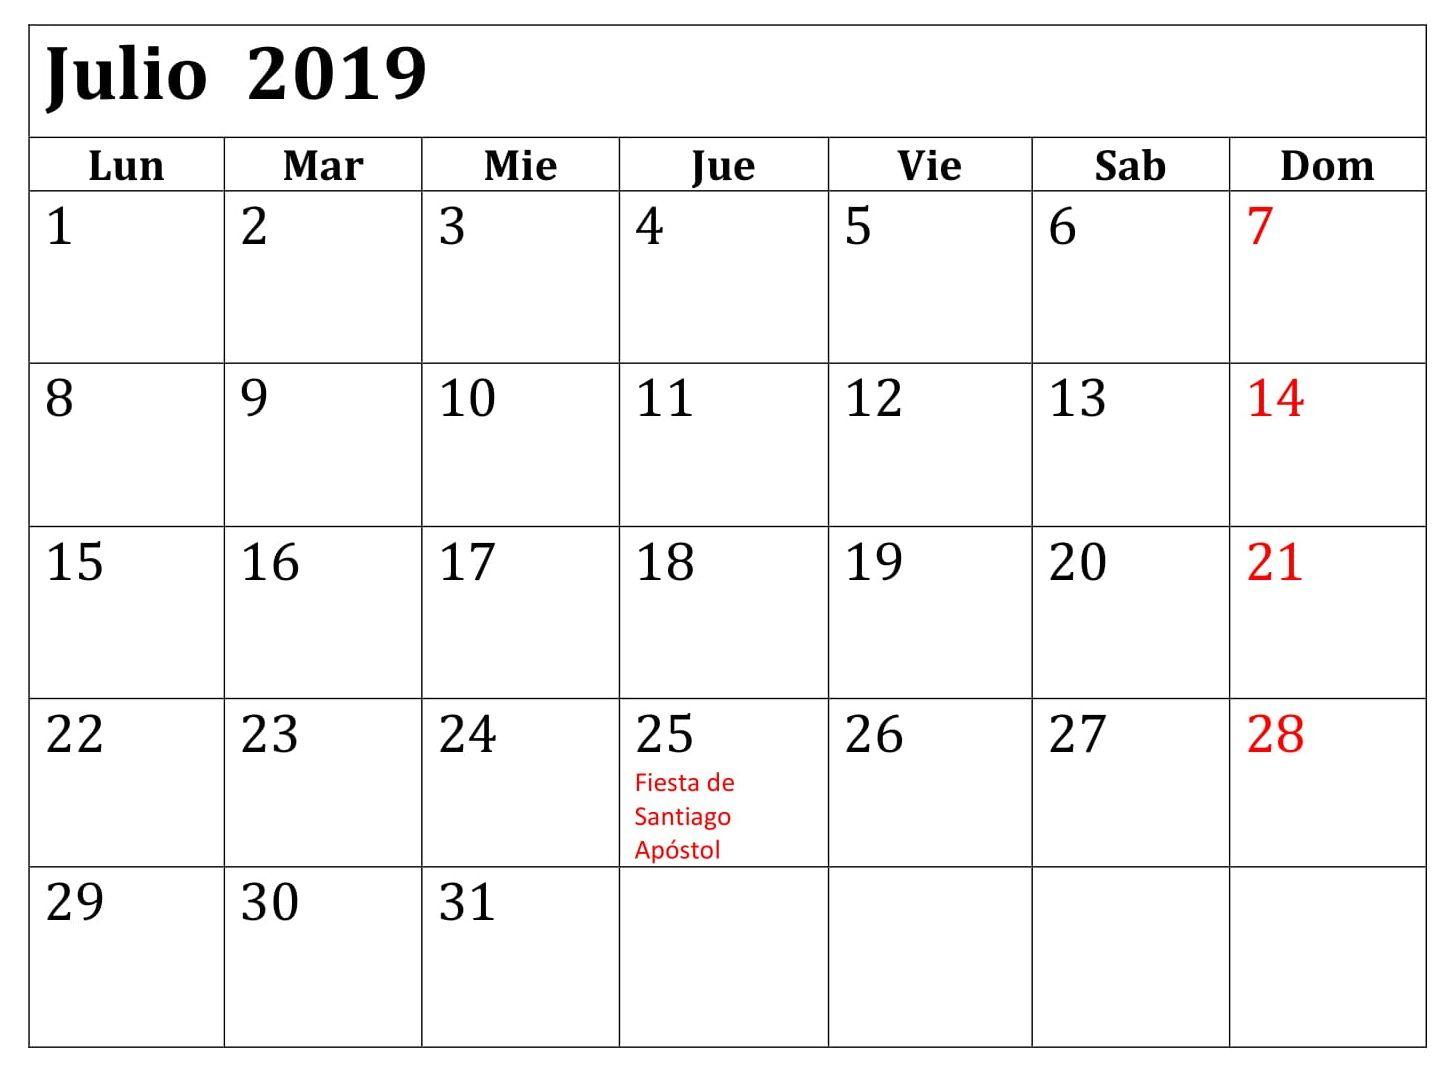 Julio Calendario 2019.Calendario 2019 Julio Pdf Calendario Julio 2019 Period